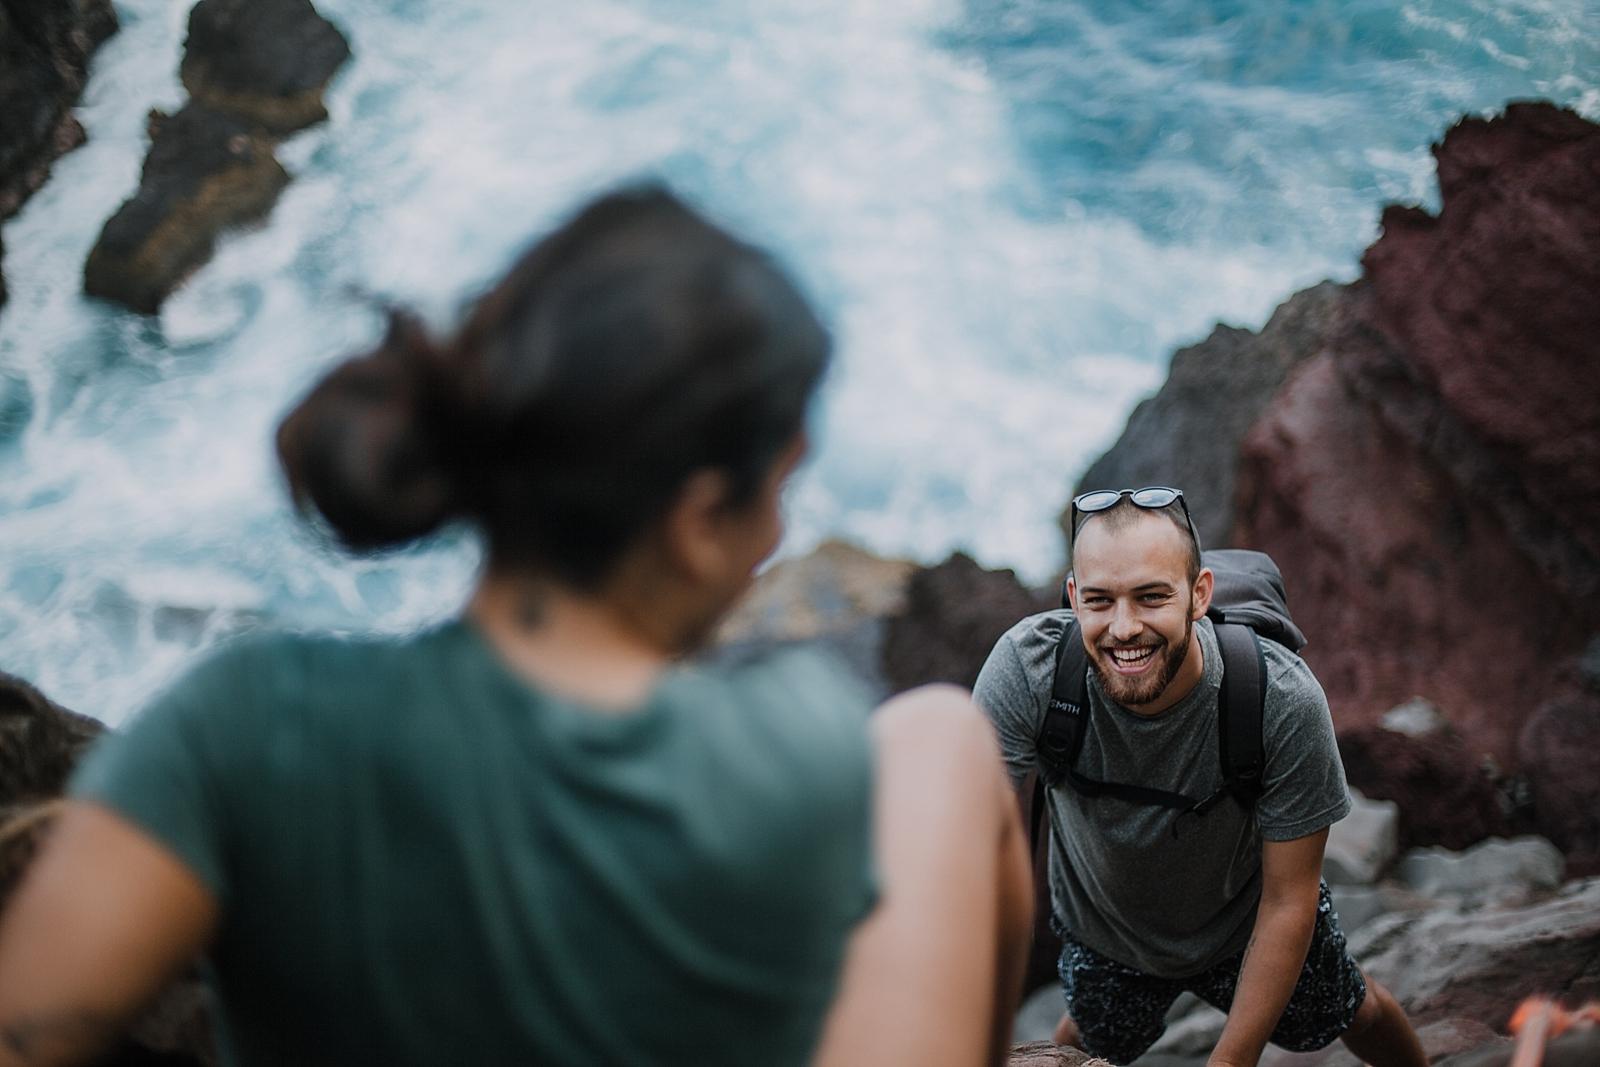 climbing in maui, maui cliffside, hawaiian cliffside, maui elopement photographer, maui wedding photographer, maui adventure, maui hiking, maui hawaii hiking, maui tide pool, alexis russell ring